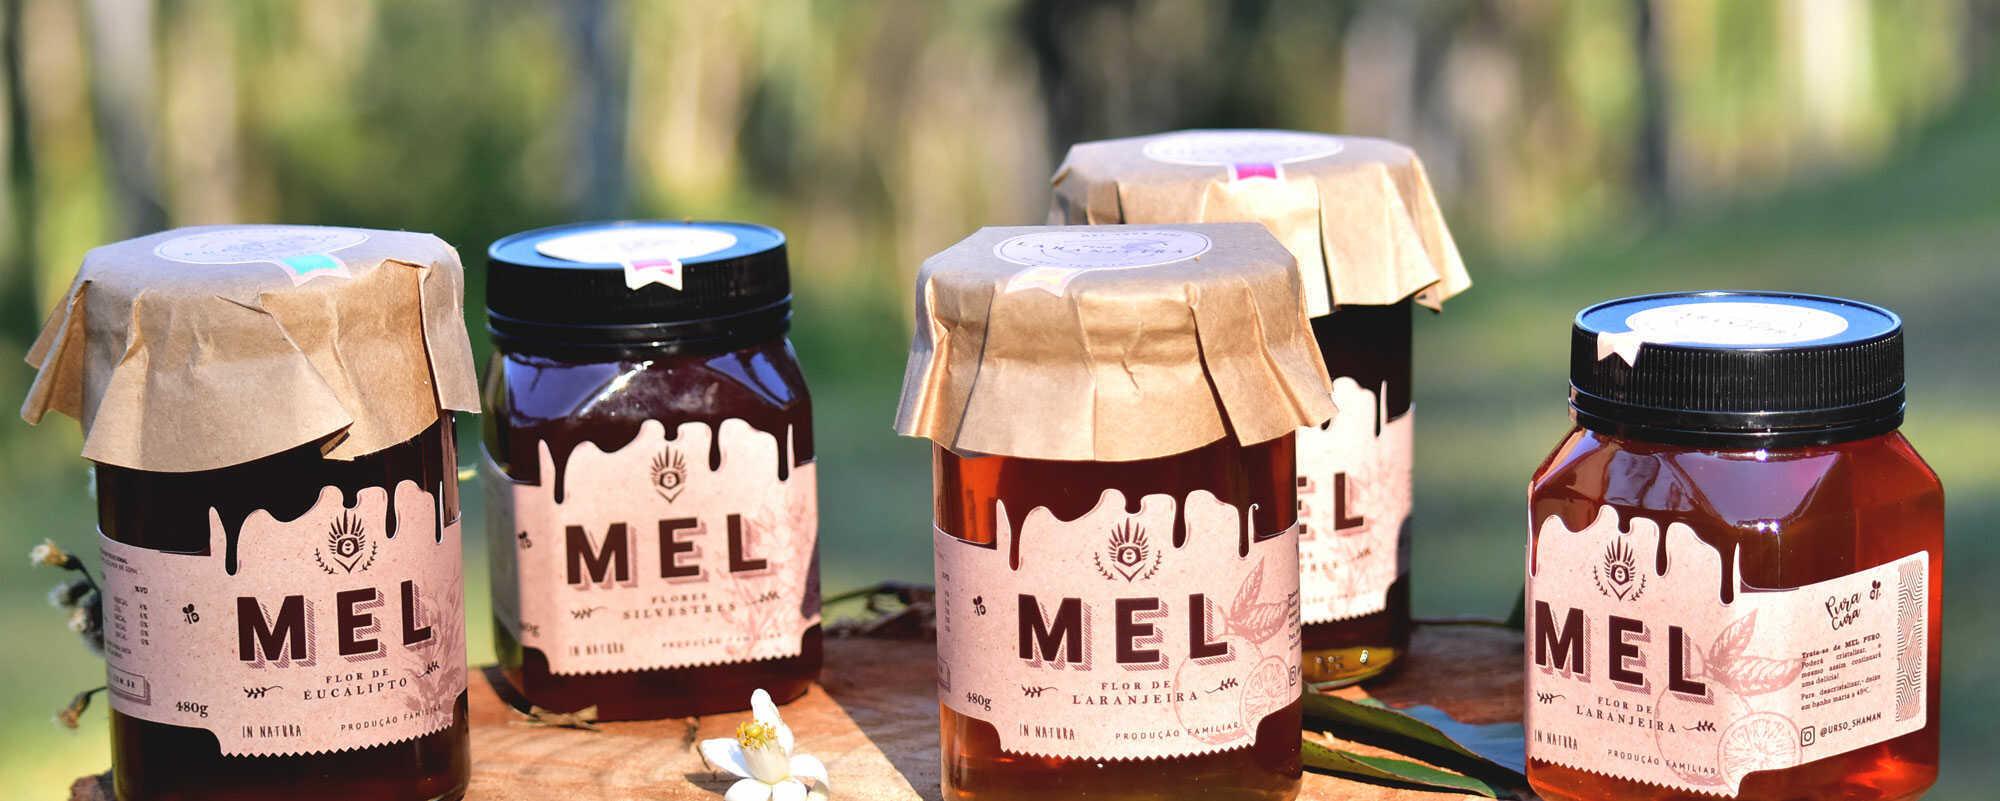 Loja do Mel: Comprar mel, propolis,